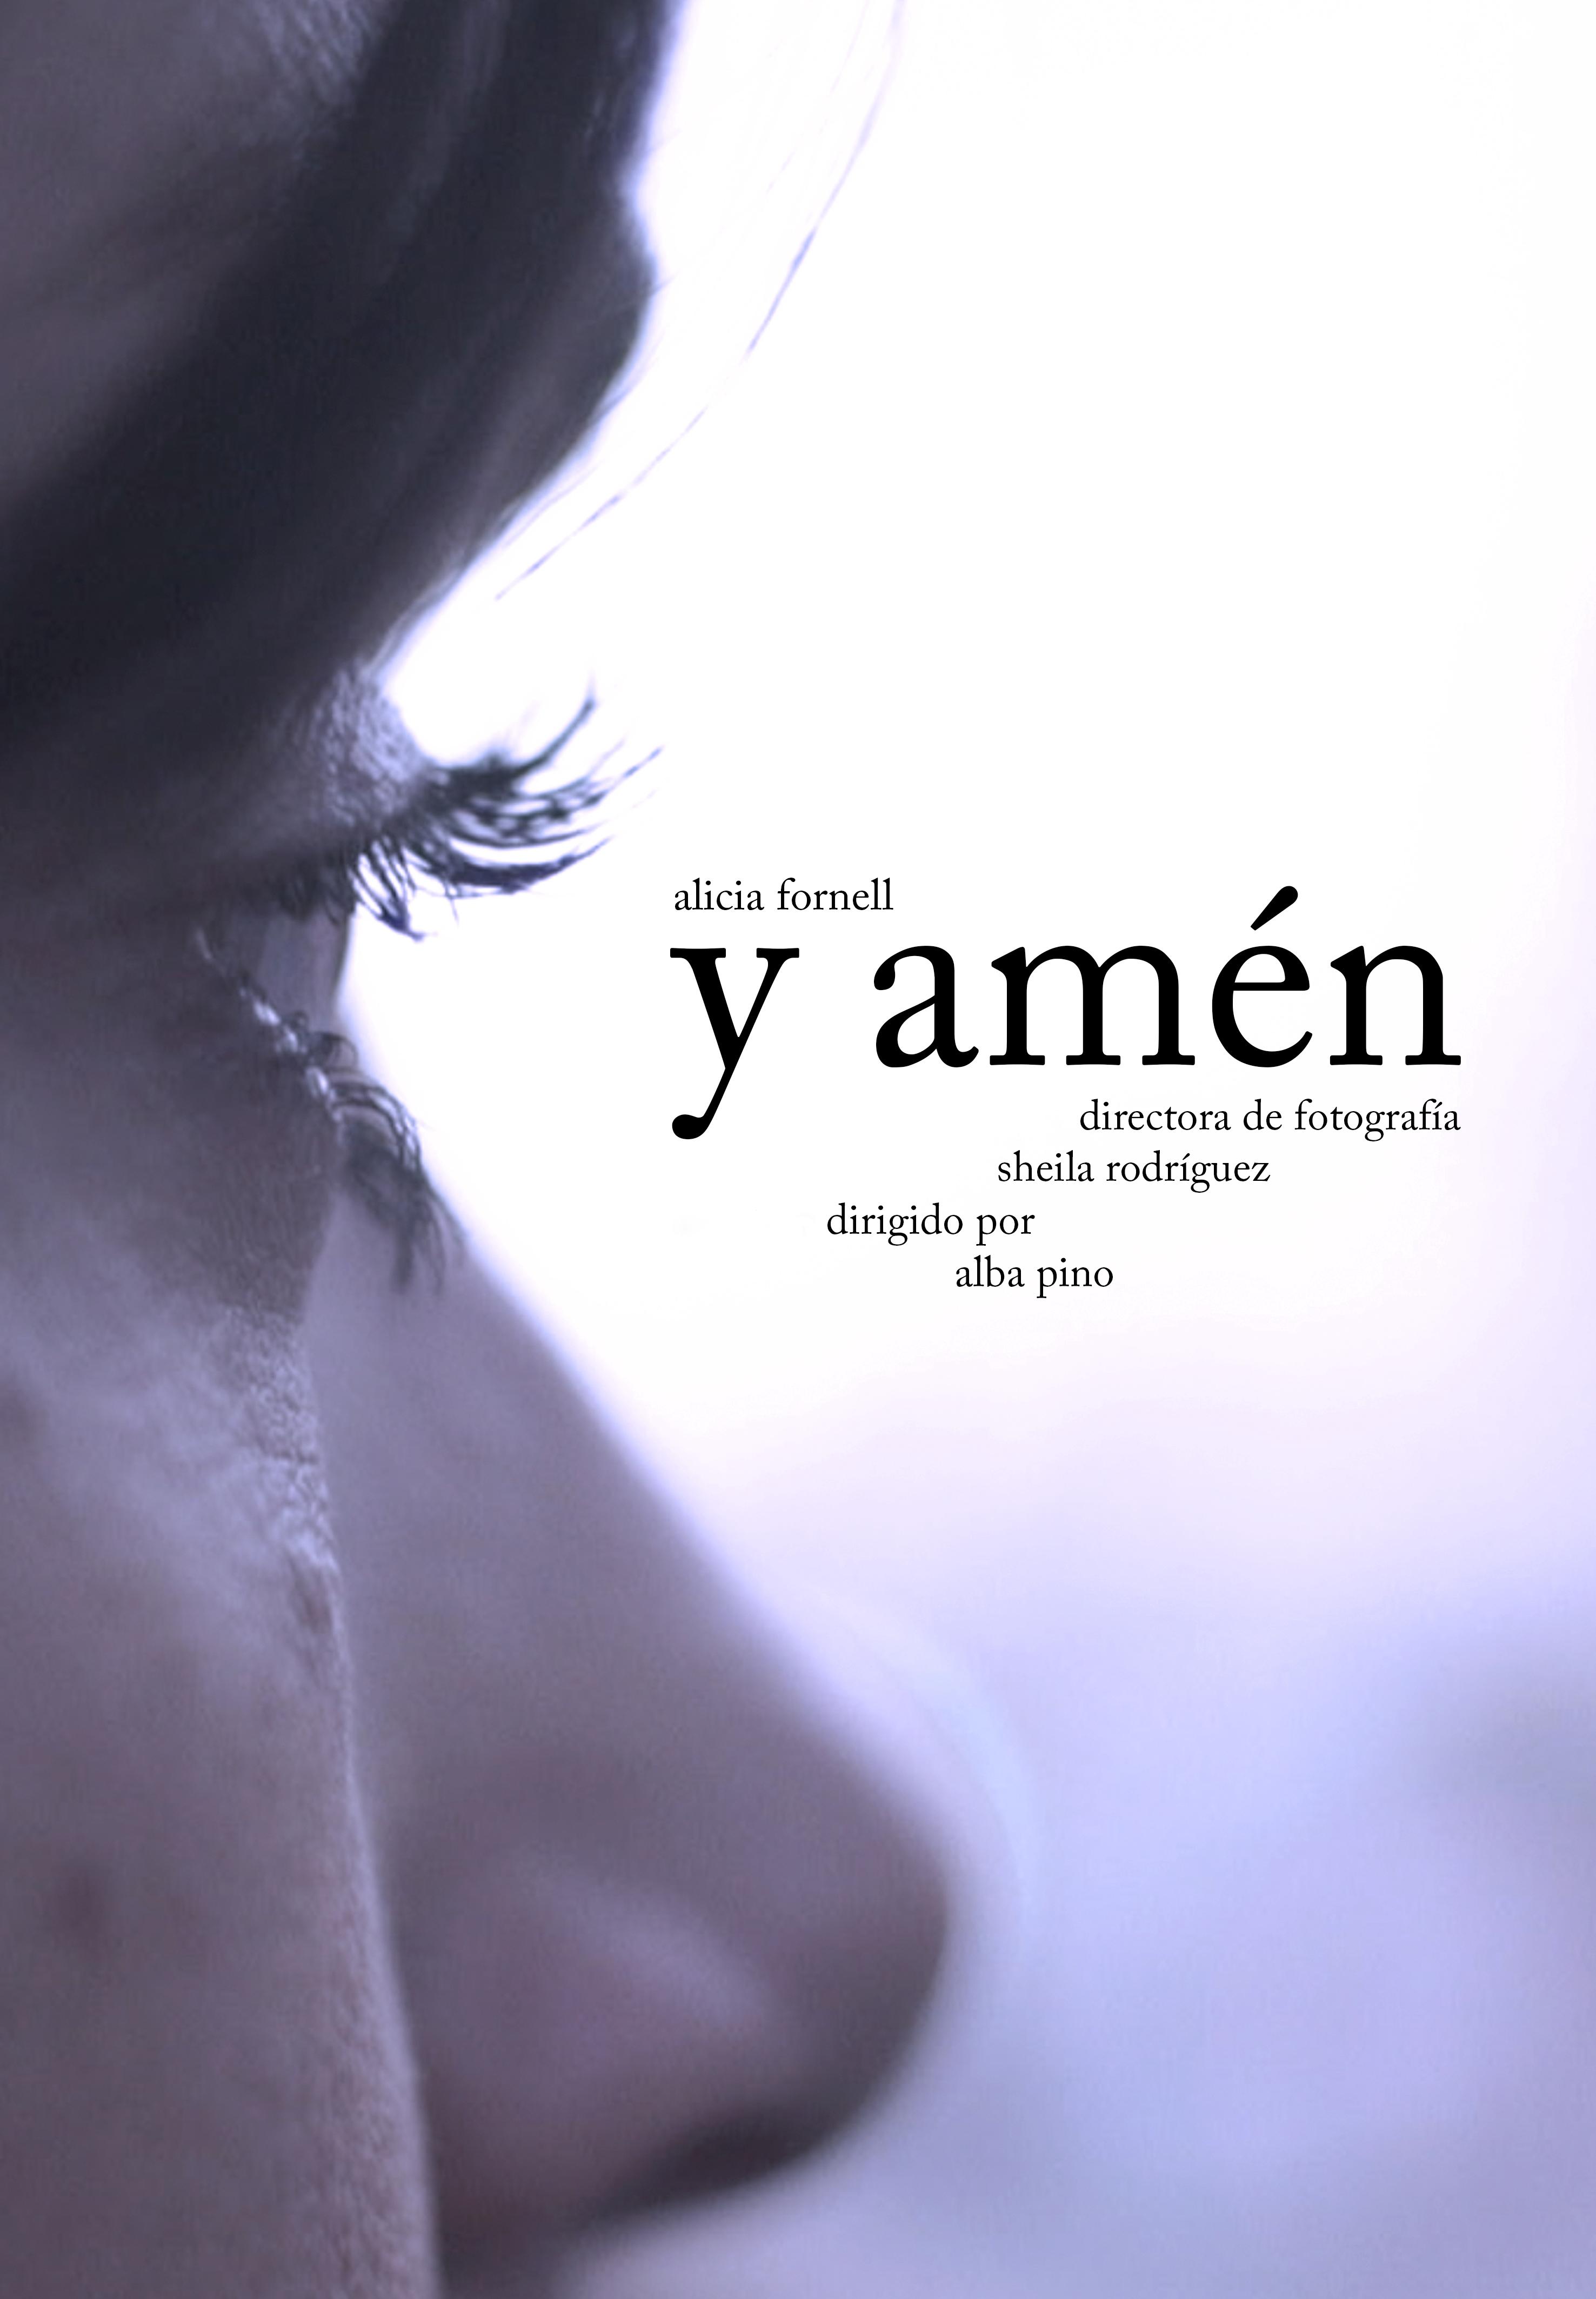 yamencartel1-1